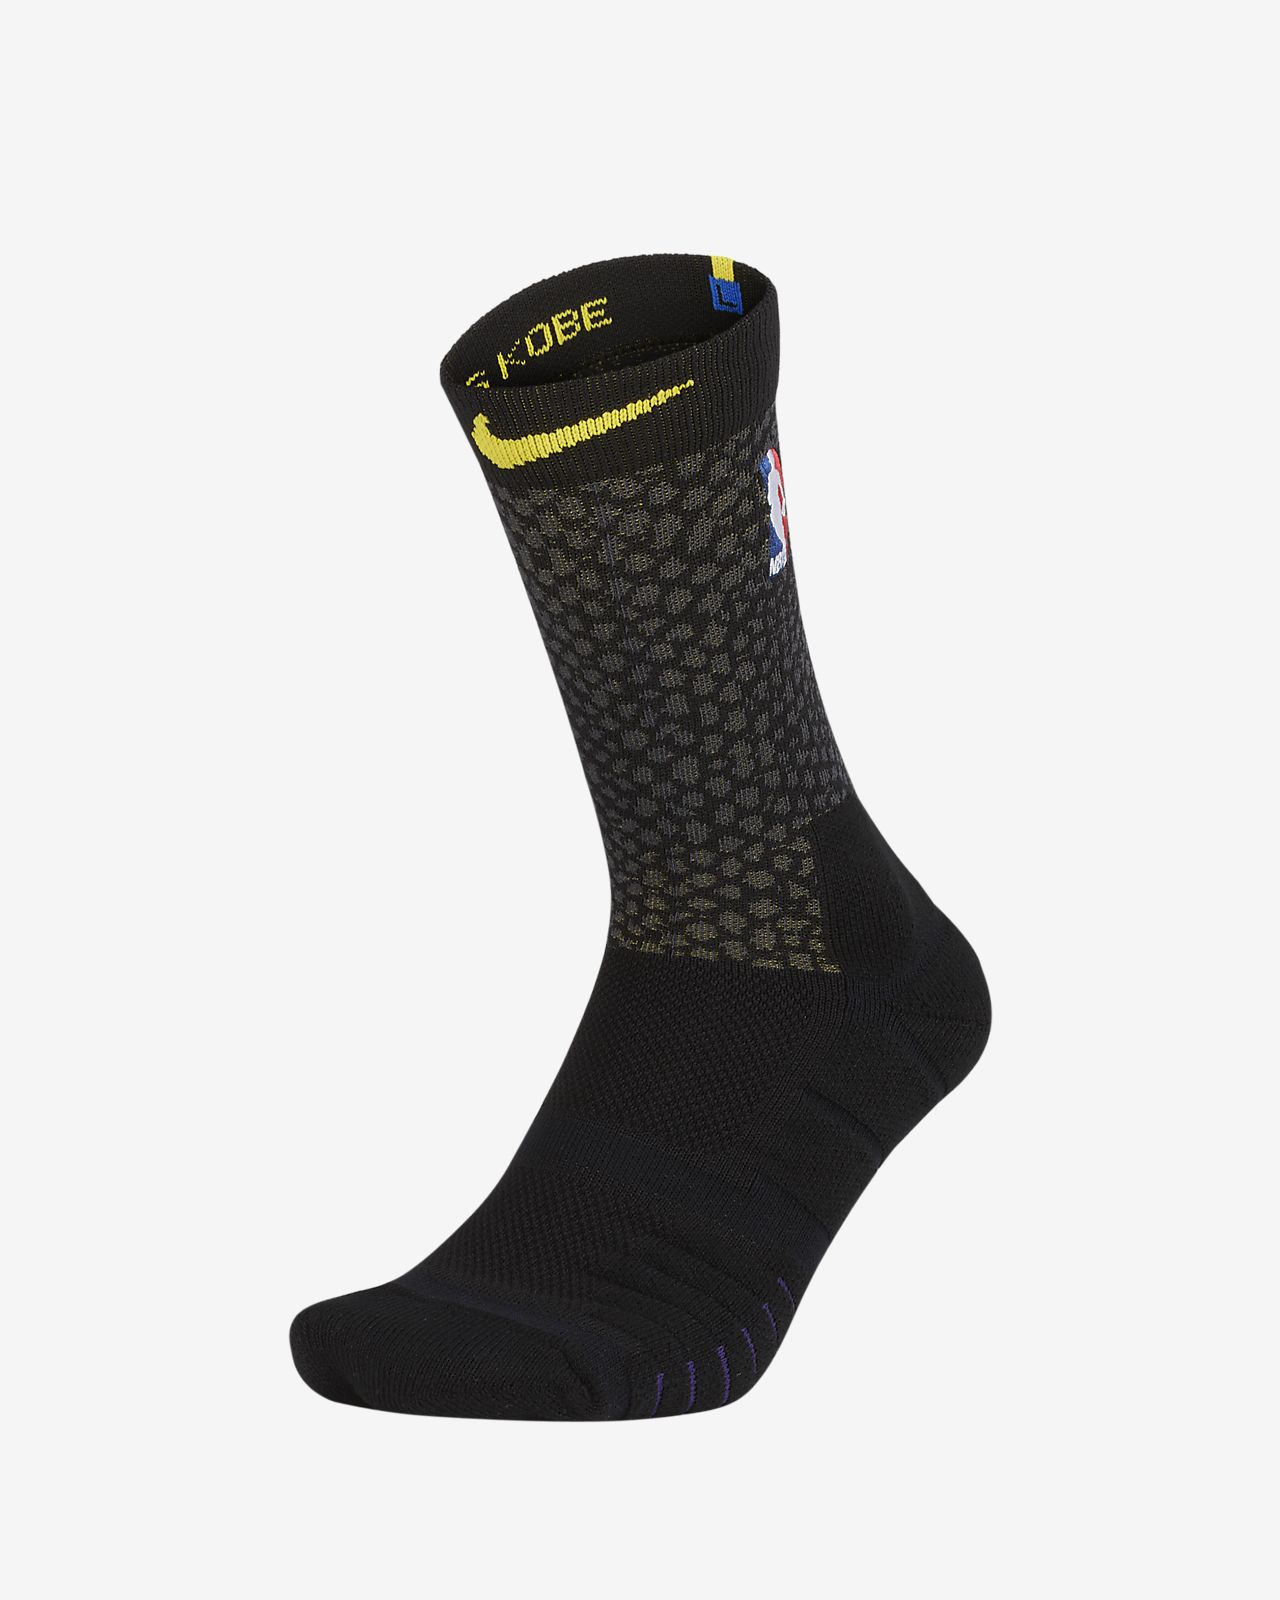 7664ccf1723 Unisex NBA Crew Socks. Los Angeles Lakers City Edition Nike Elite Quick